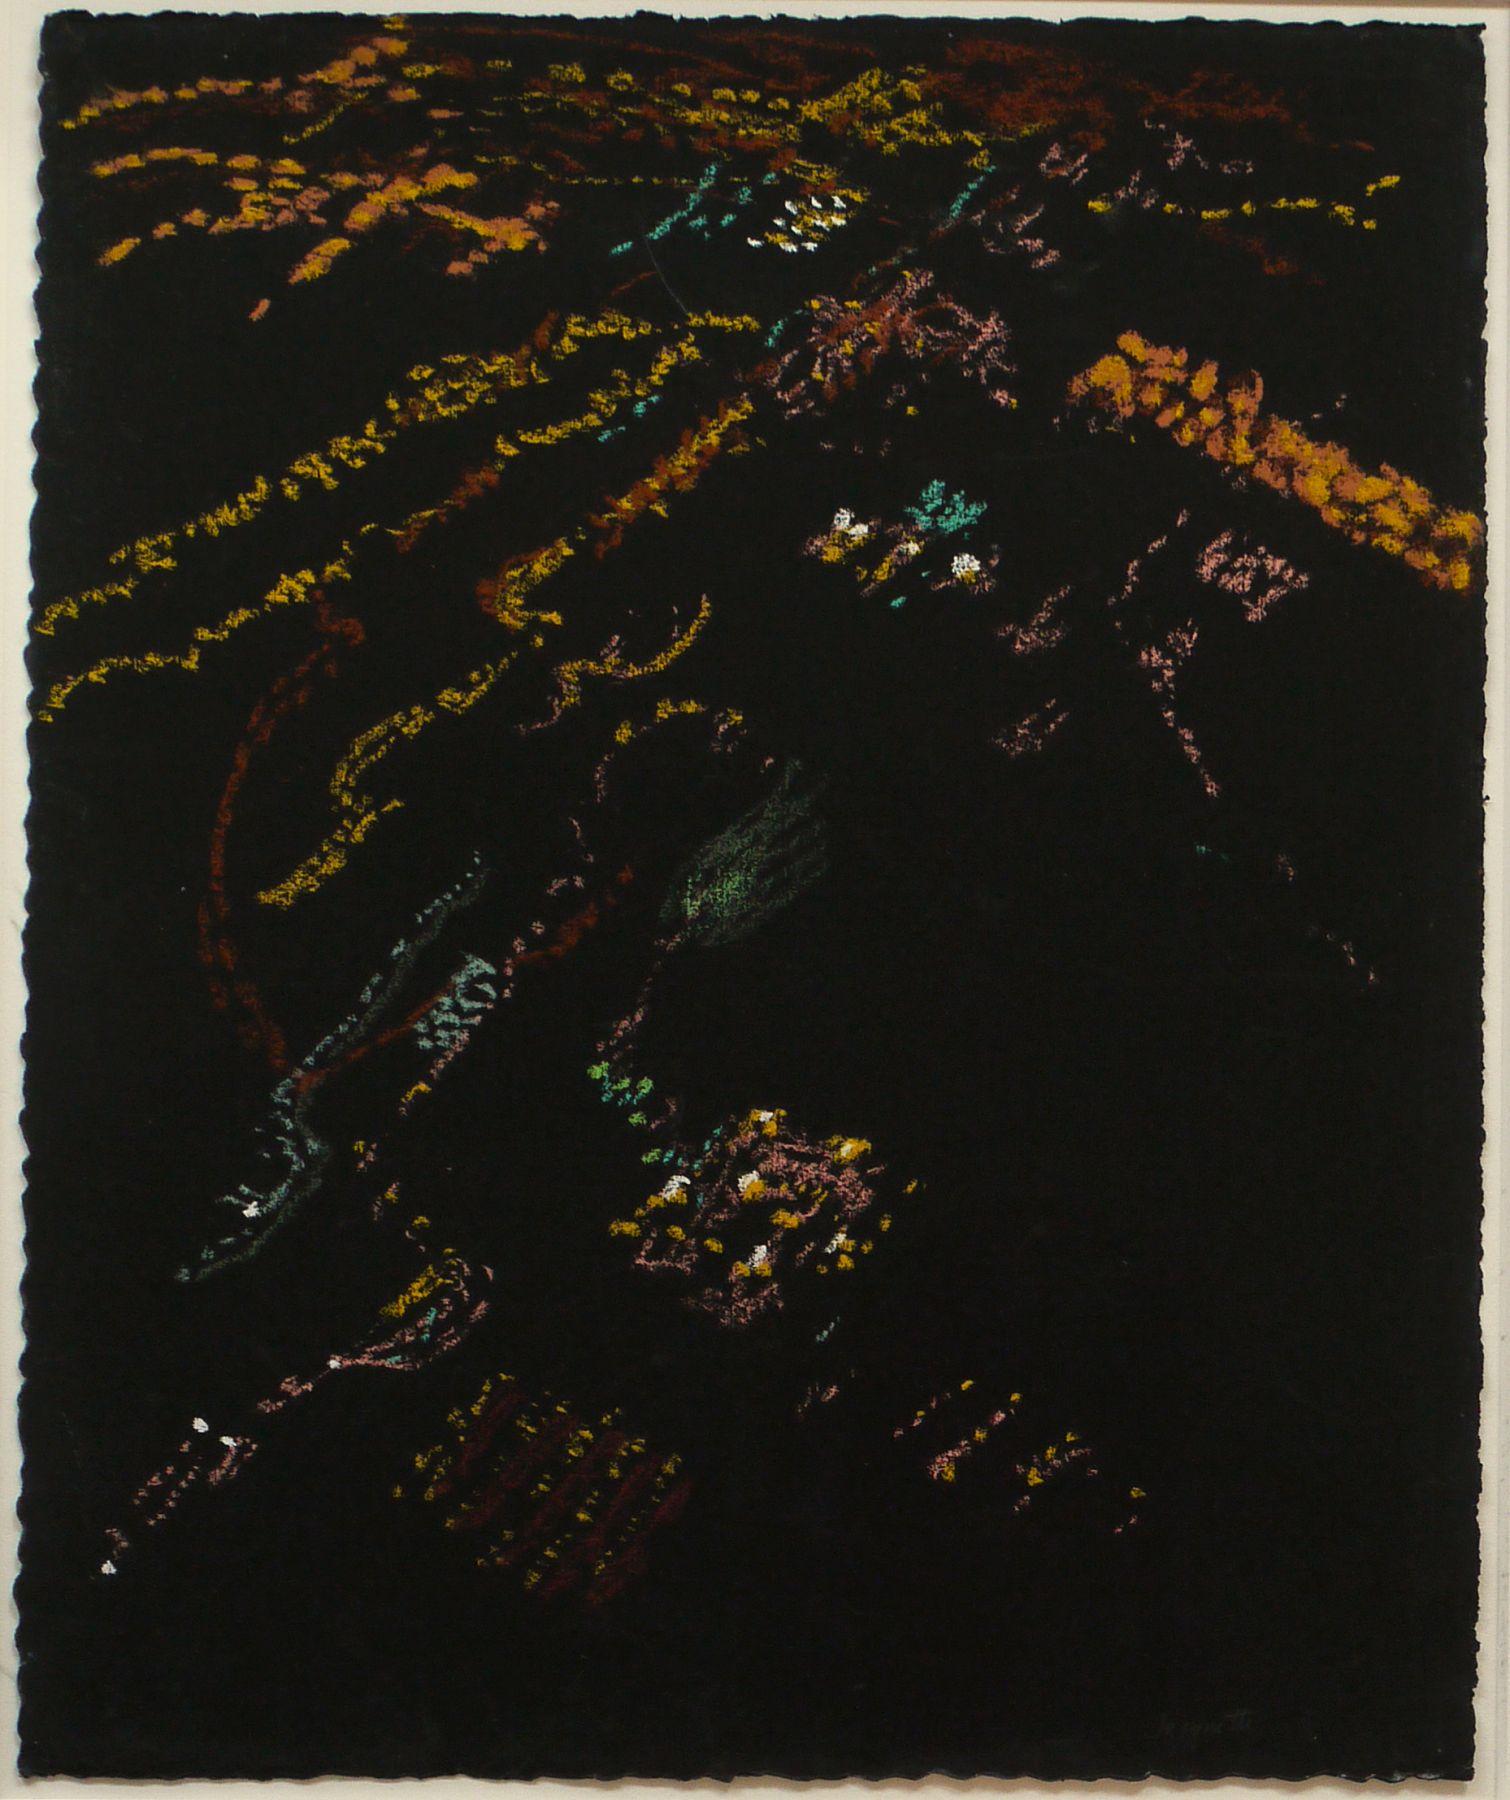 Night Lights, Reclining Plane I, 2007, Pastel on paper